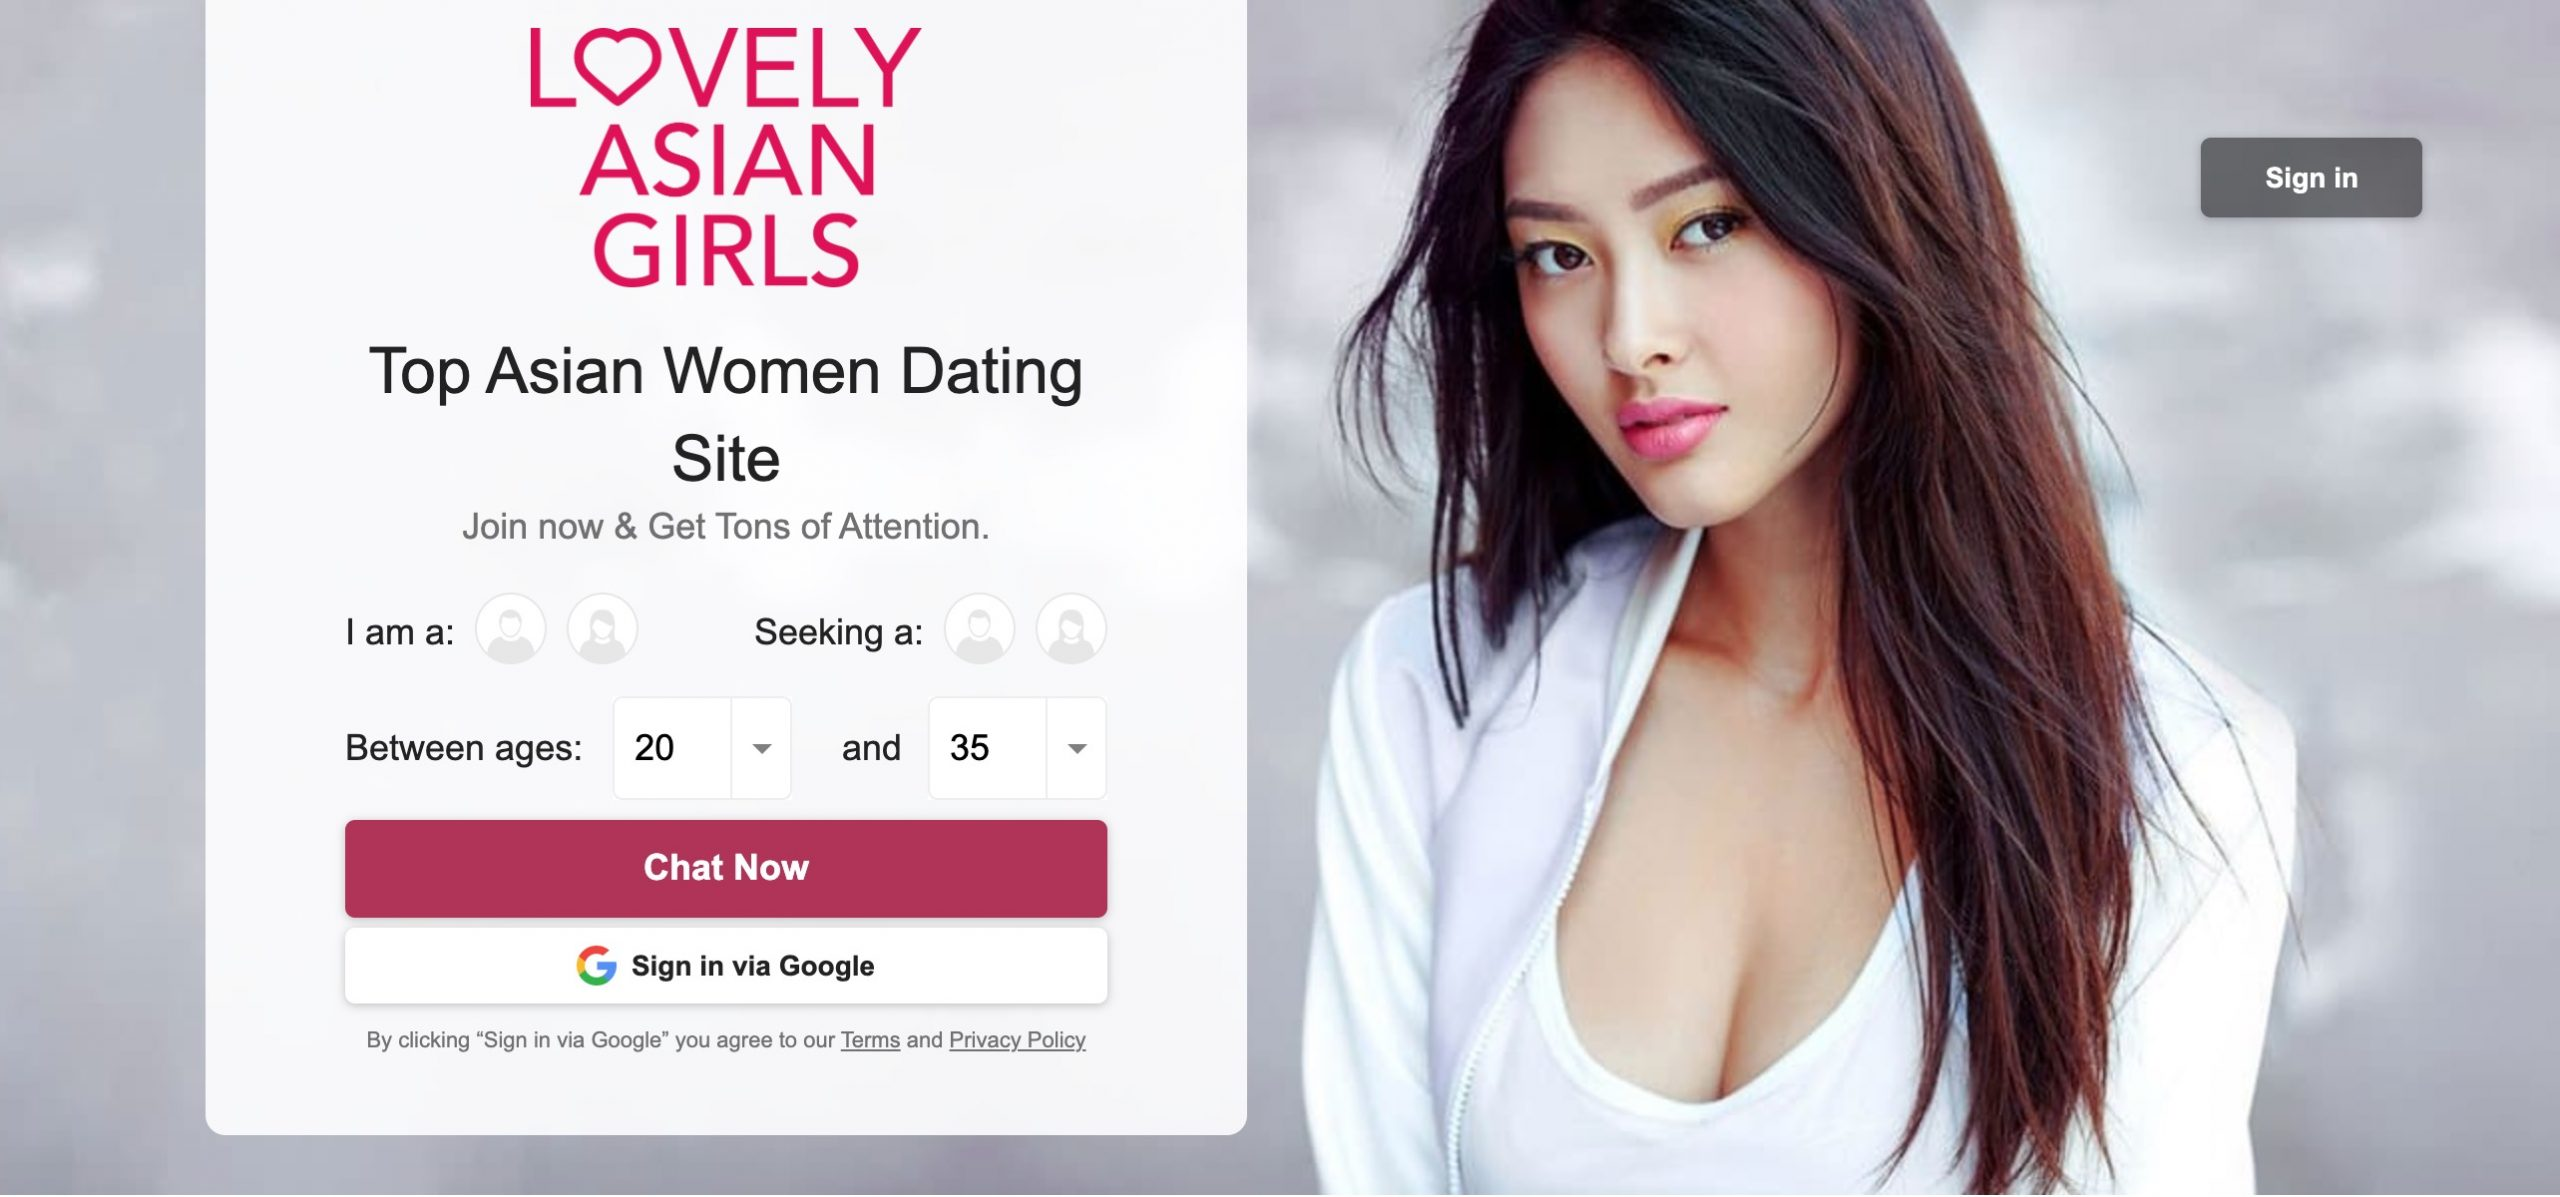 LovelyAsianGirls main page